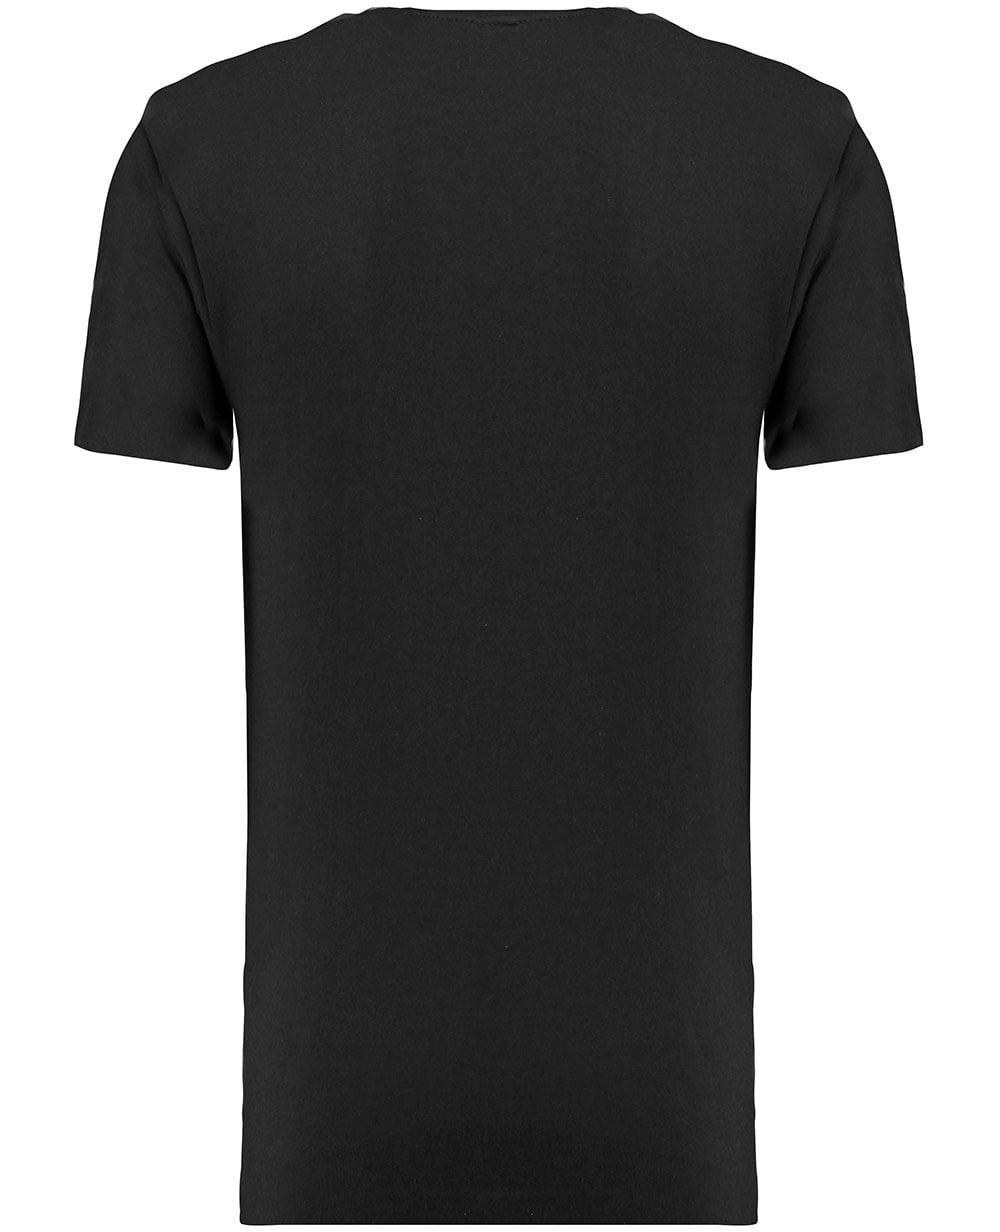 Industrialize mens t shirt black basic plain long line for Long line short sleeve t shirt